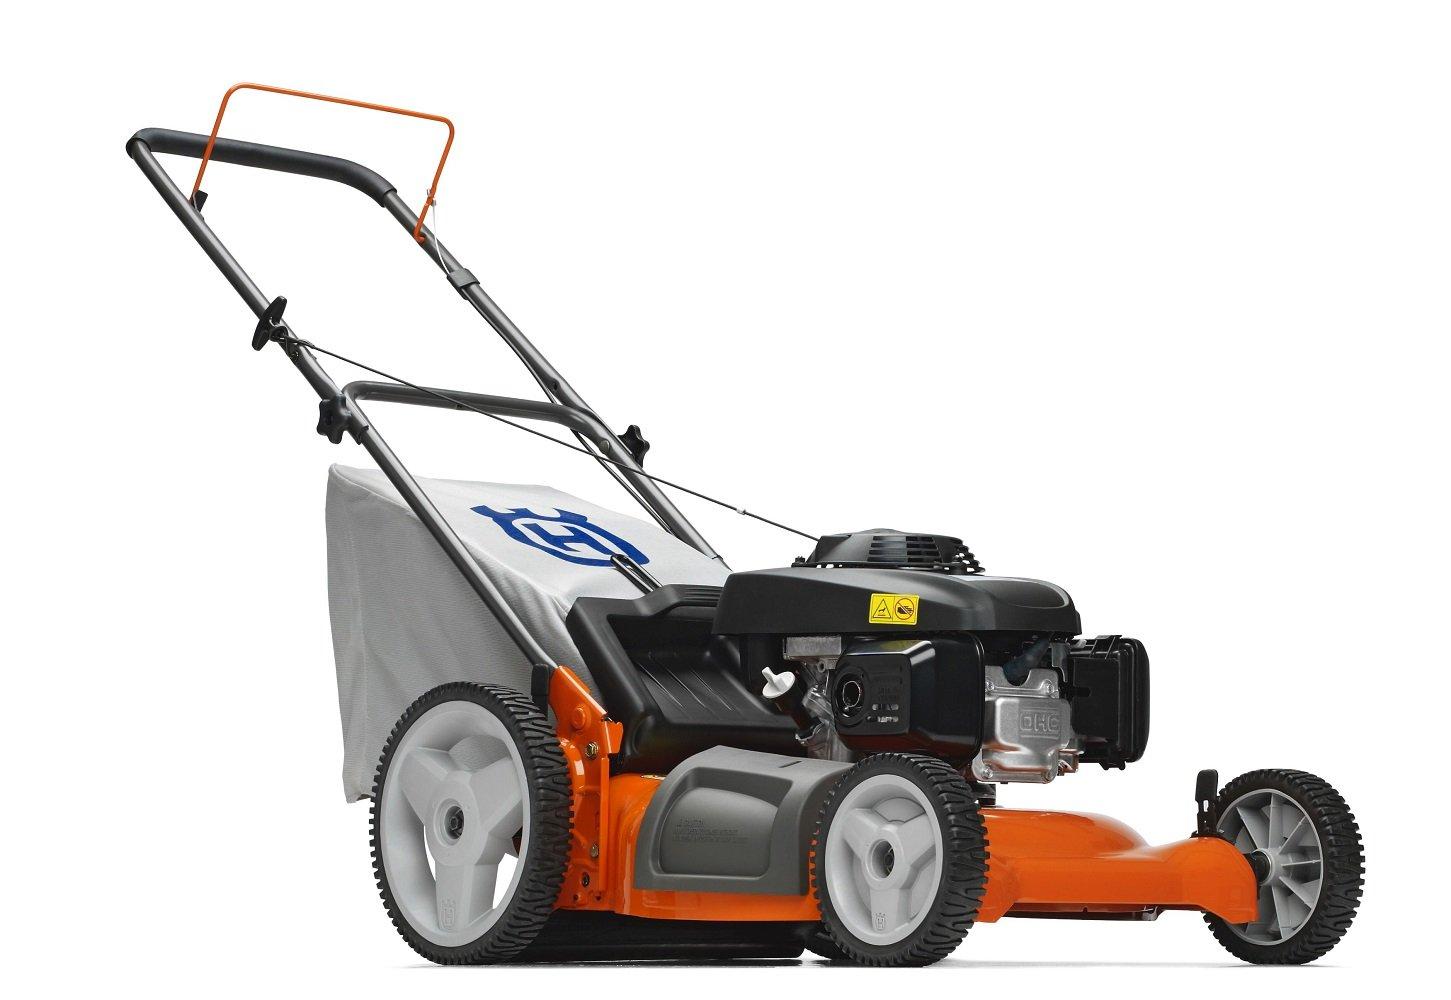 Amazon.com : Husqvarna 7021P 21-Inch 160cc Honda GCV160 Gas Powered 3-N-1 Push  Lawn Mower With High Rear Wheels : Walk Behind Lawn Mowers : Garden &  Outdoor